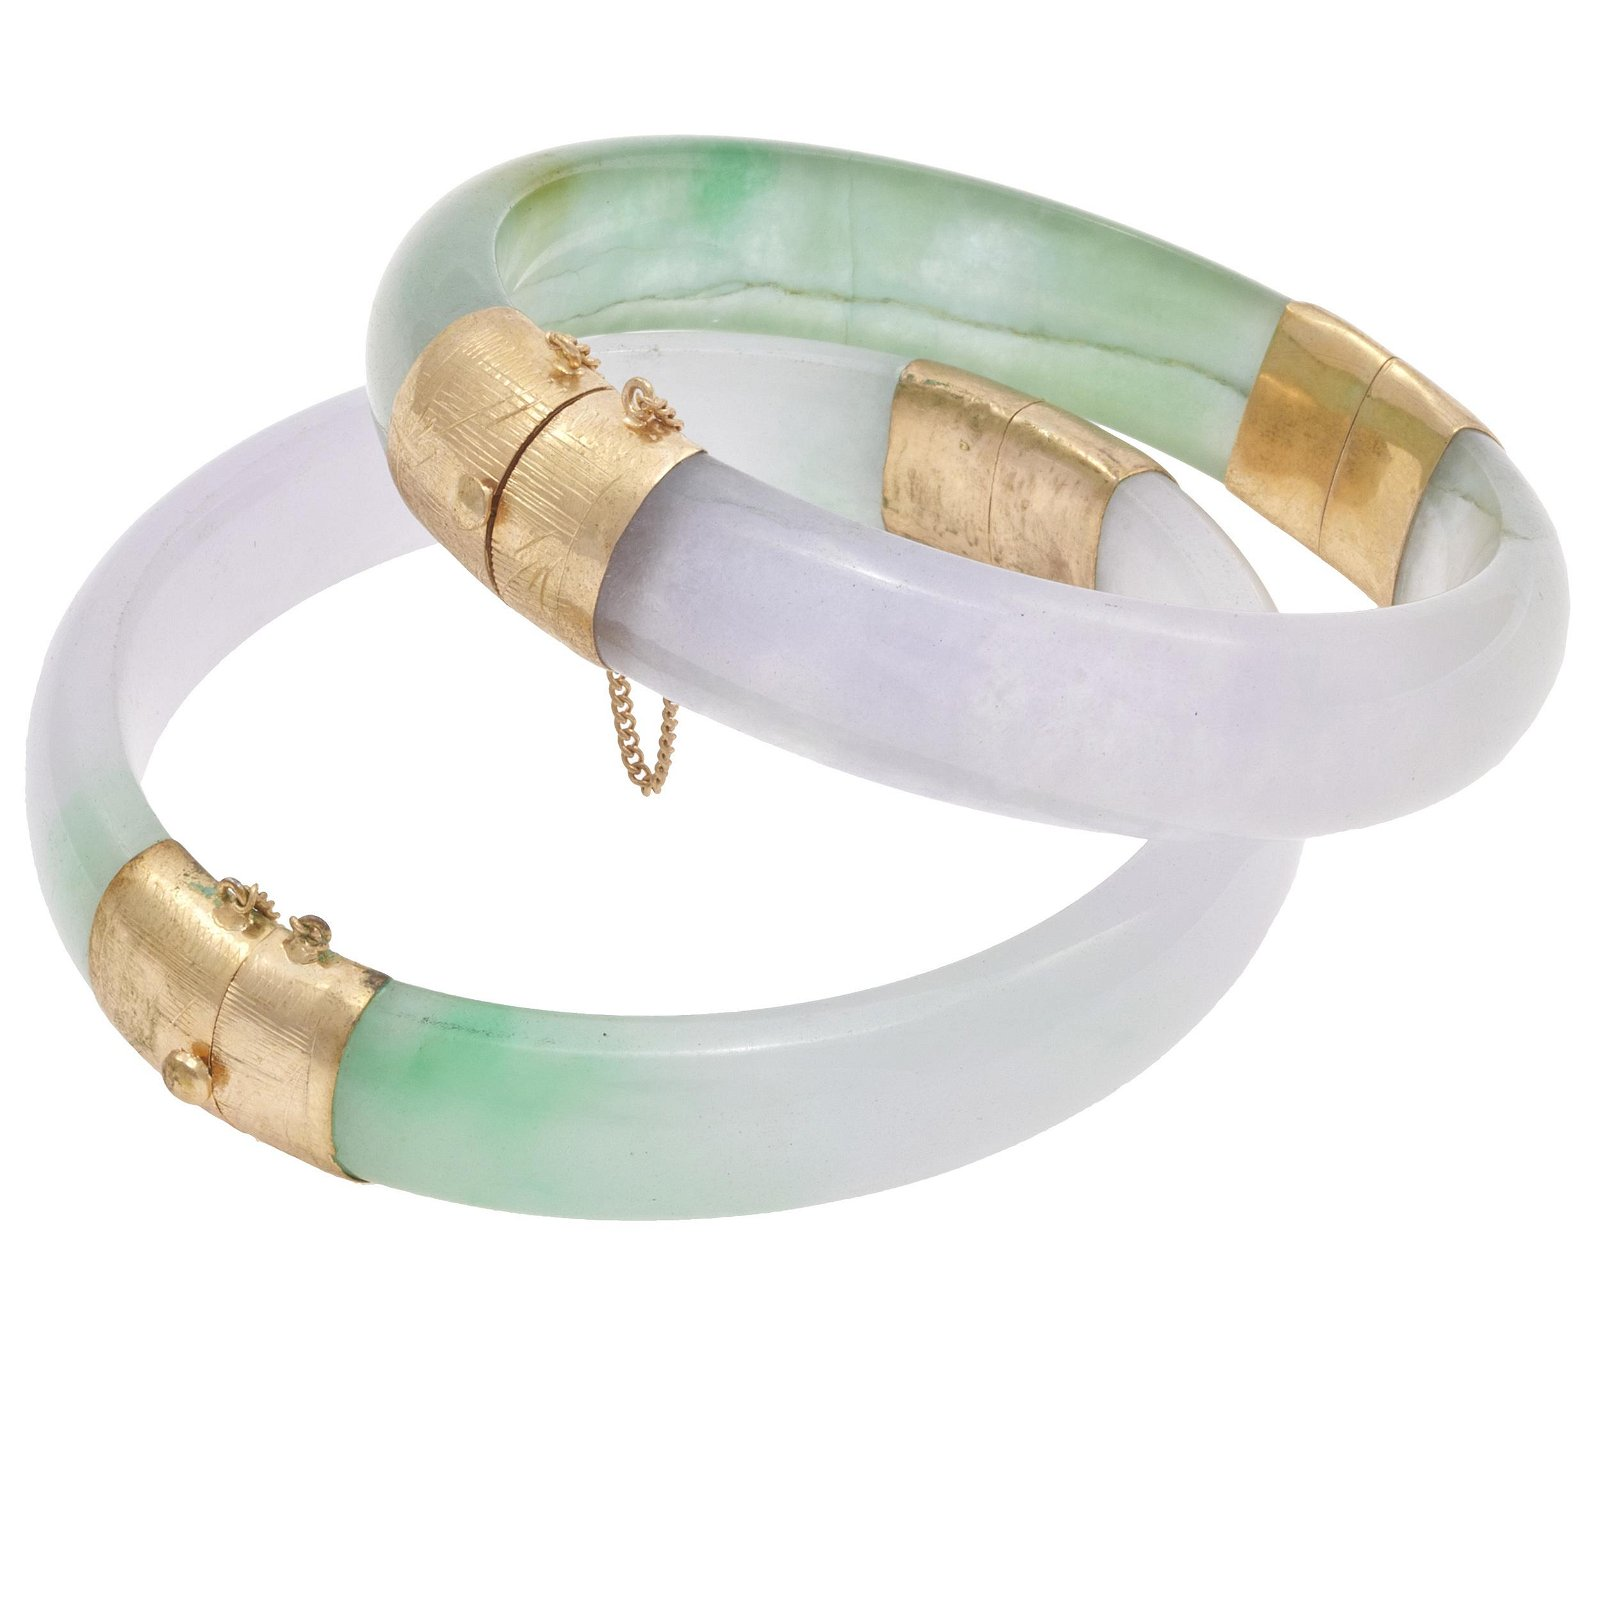 Collection of Two Jade, 14k Bangle Bracelets